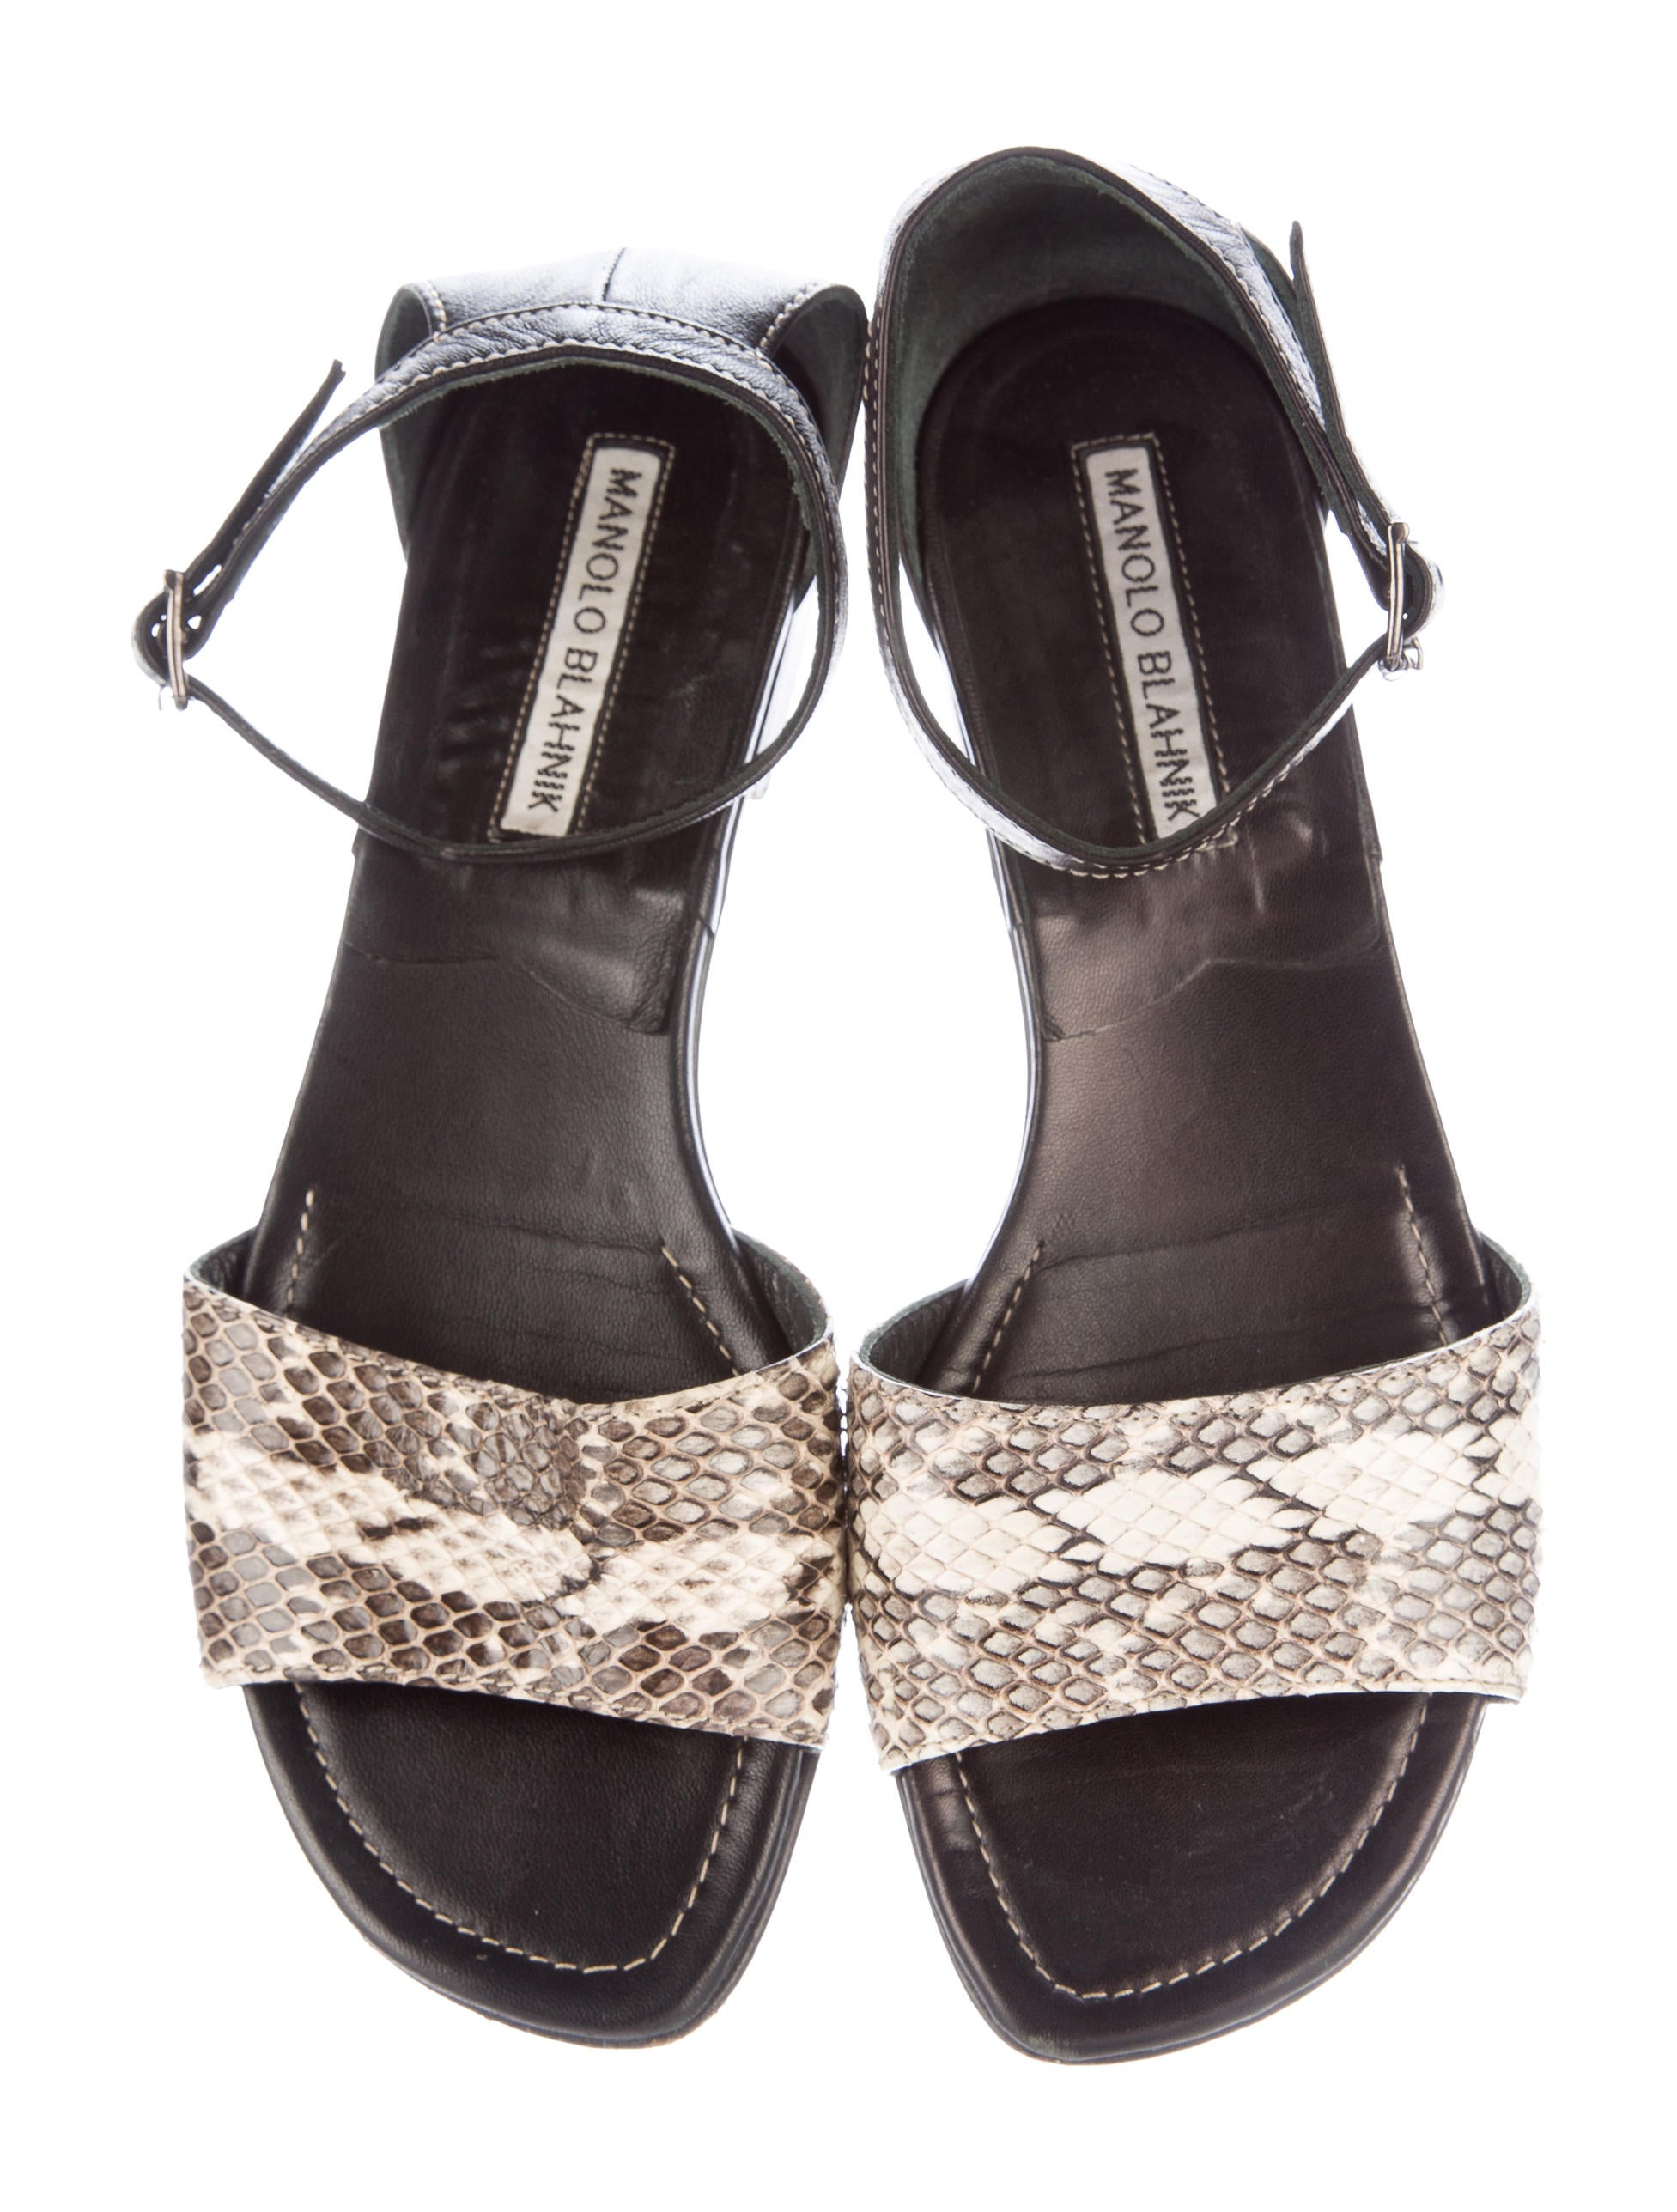 Manolo Blahnik Snakeskin Flat Sandals Shoes Moo60959